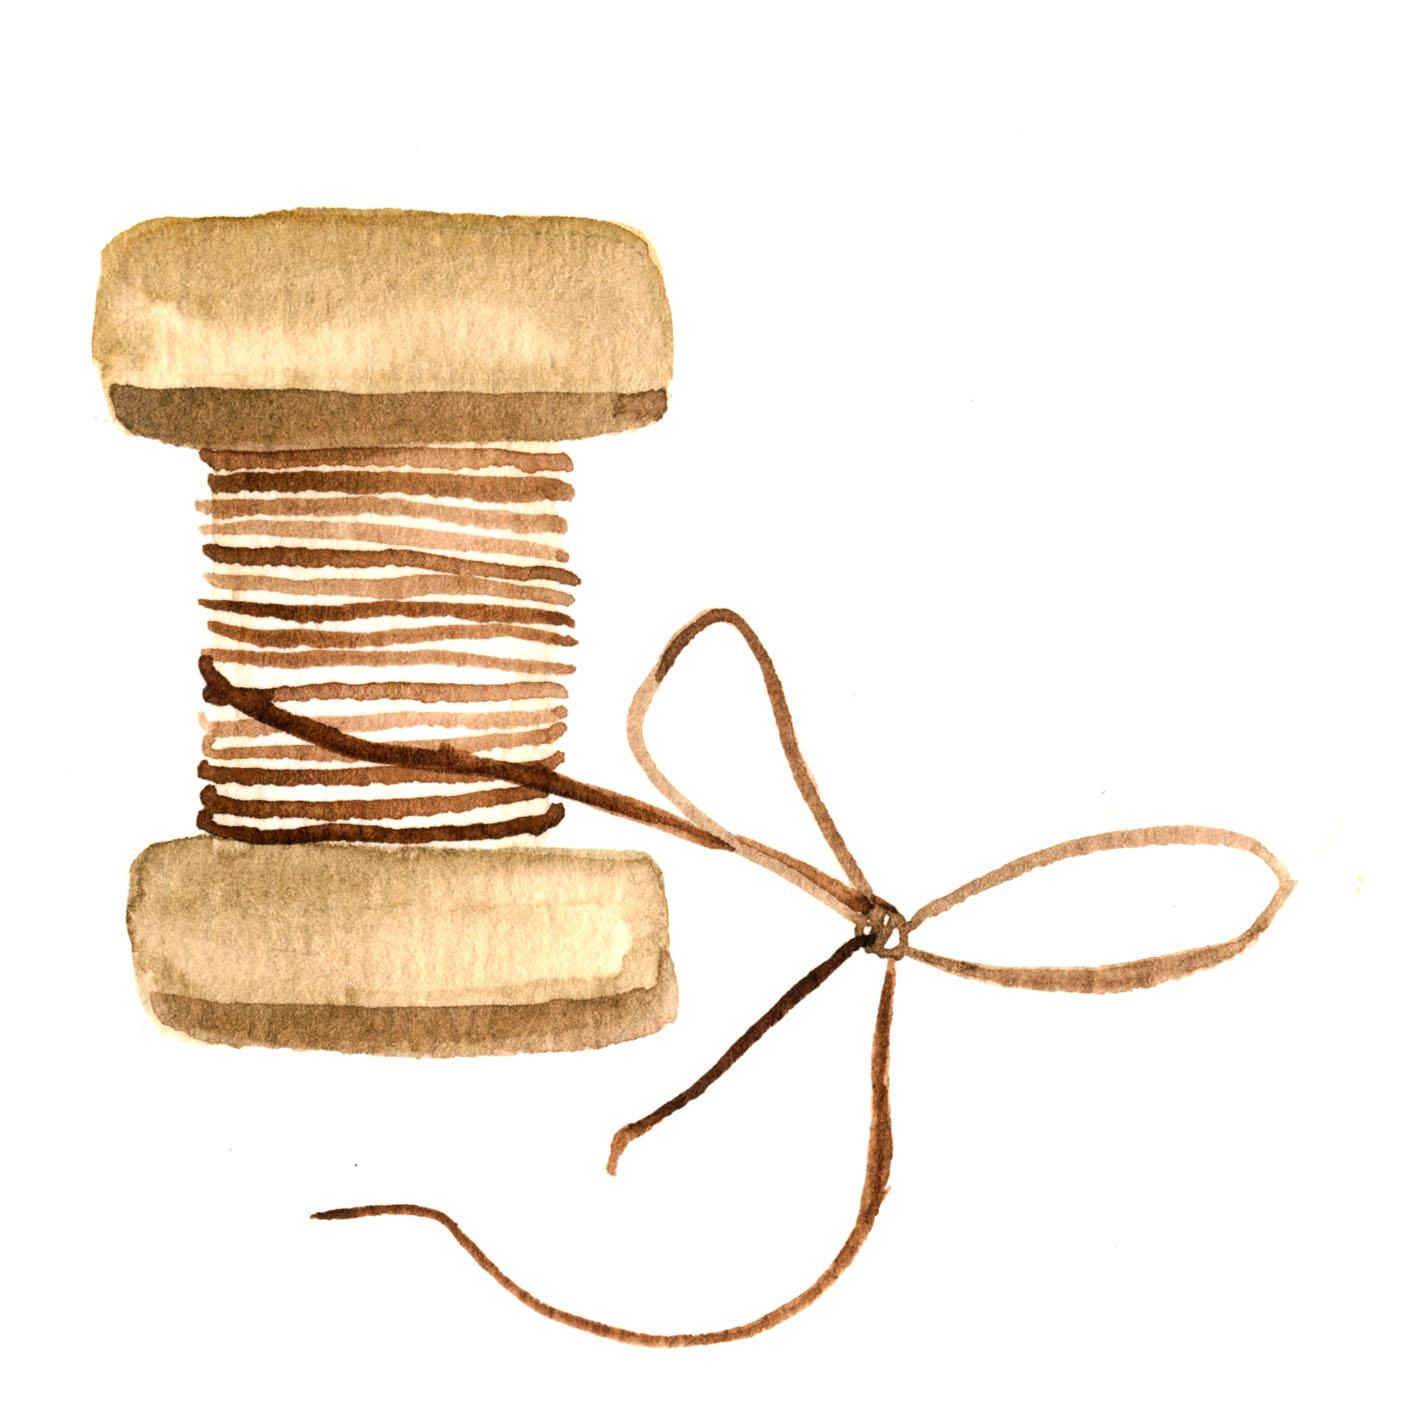 knot1.jpg